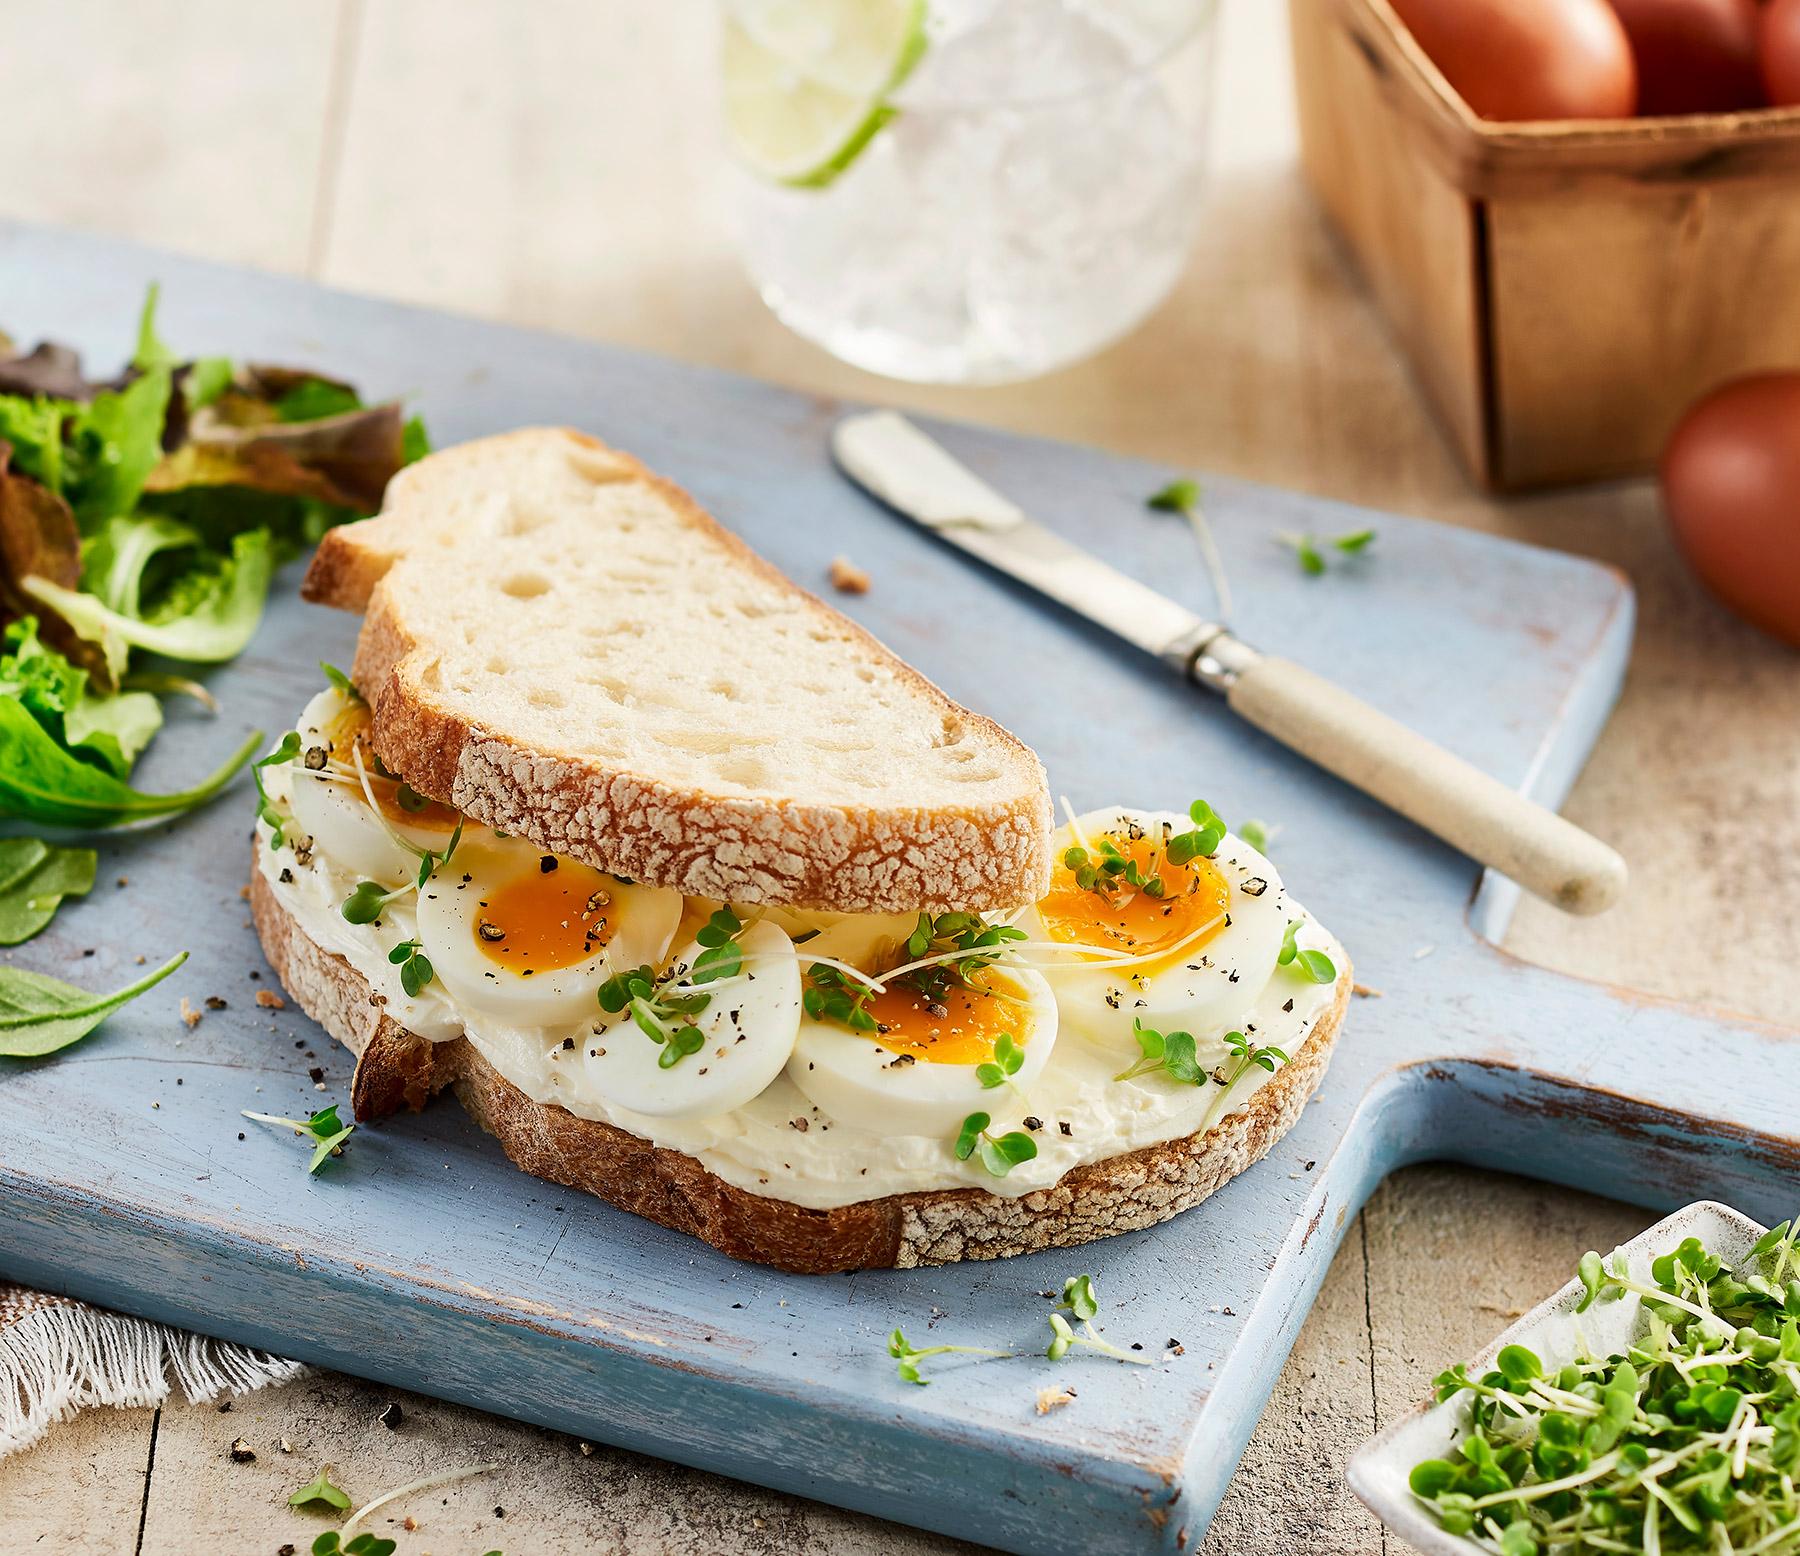 Philadelphia, egg and cress sourdough sandwich